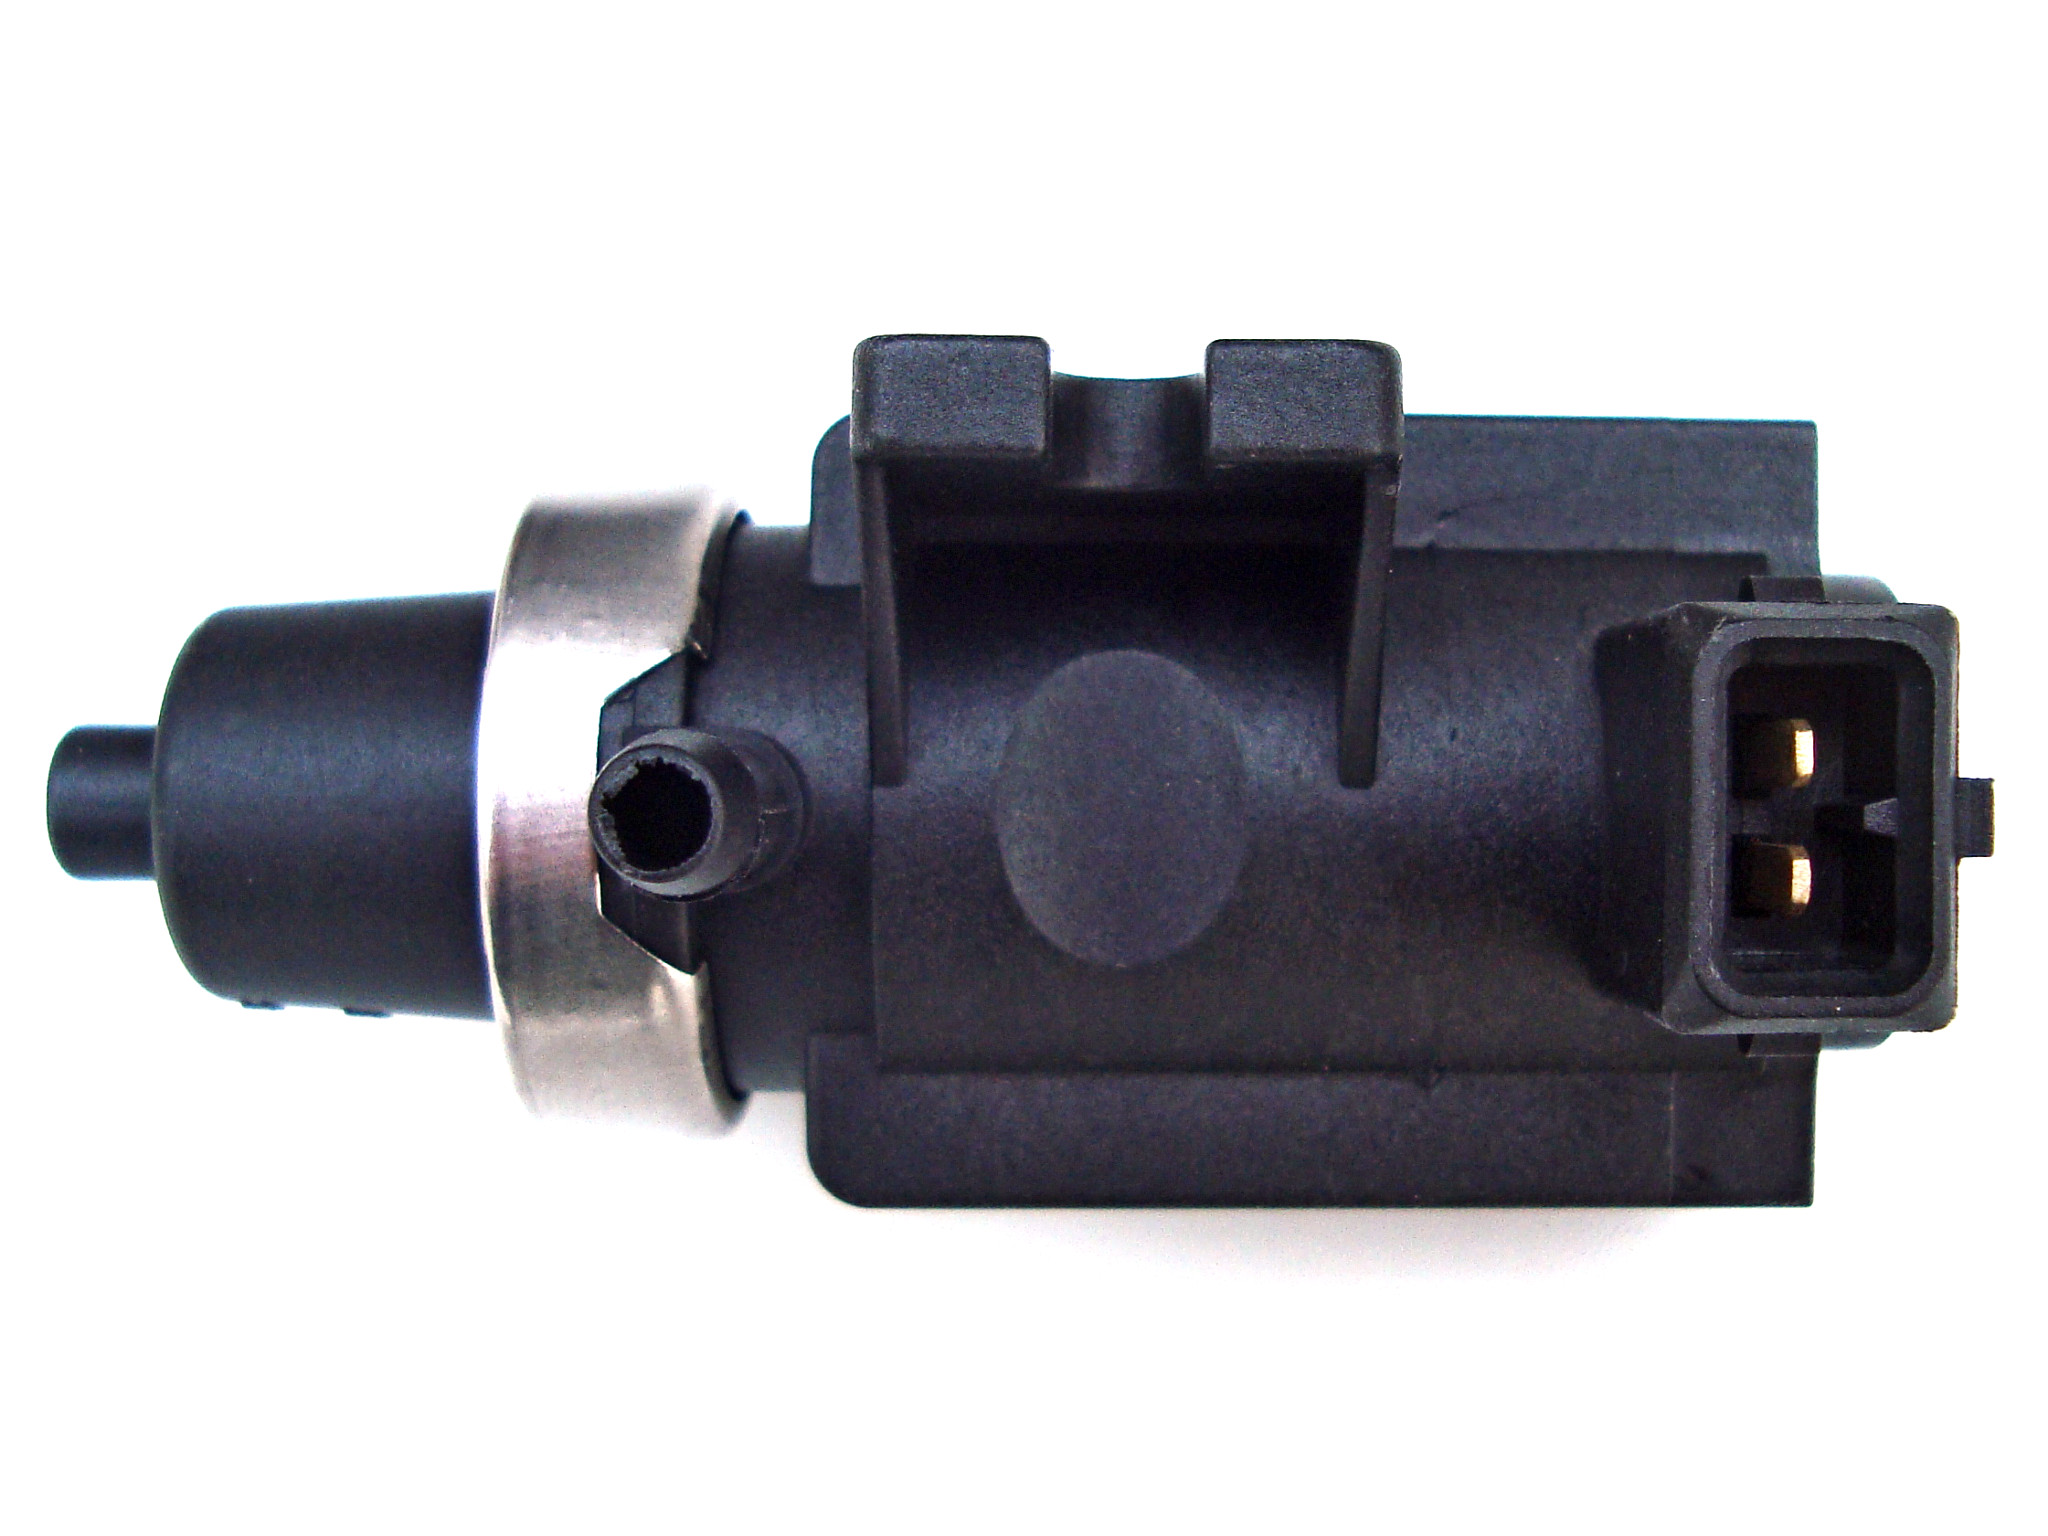 клапан n75 турбины pierburg 1h0906627 pa6.6-gf35, фото